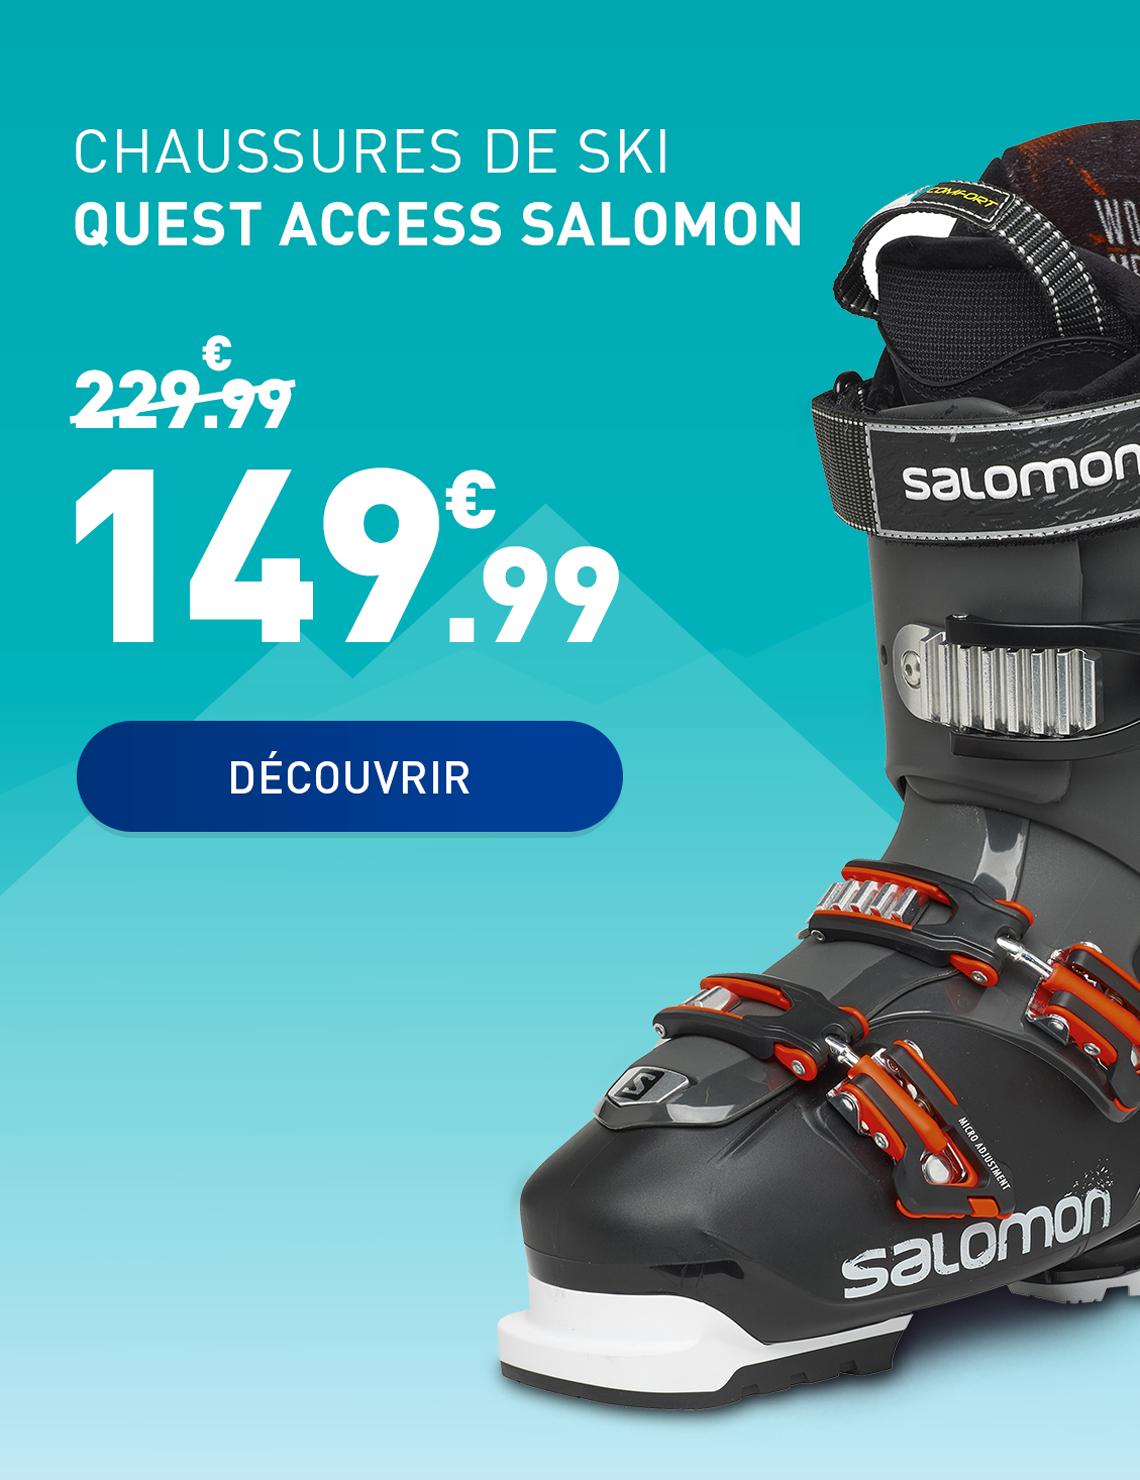 1_chaussures-ski-salomon_lp_noel2016